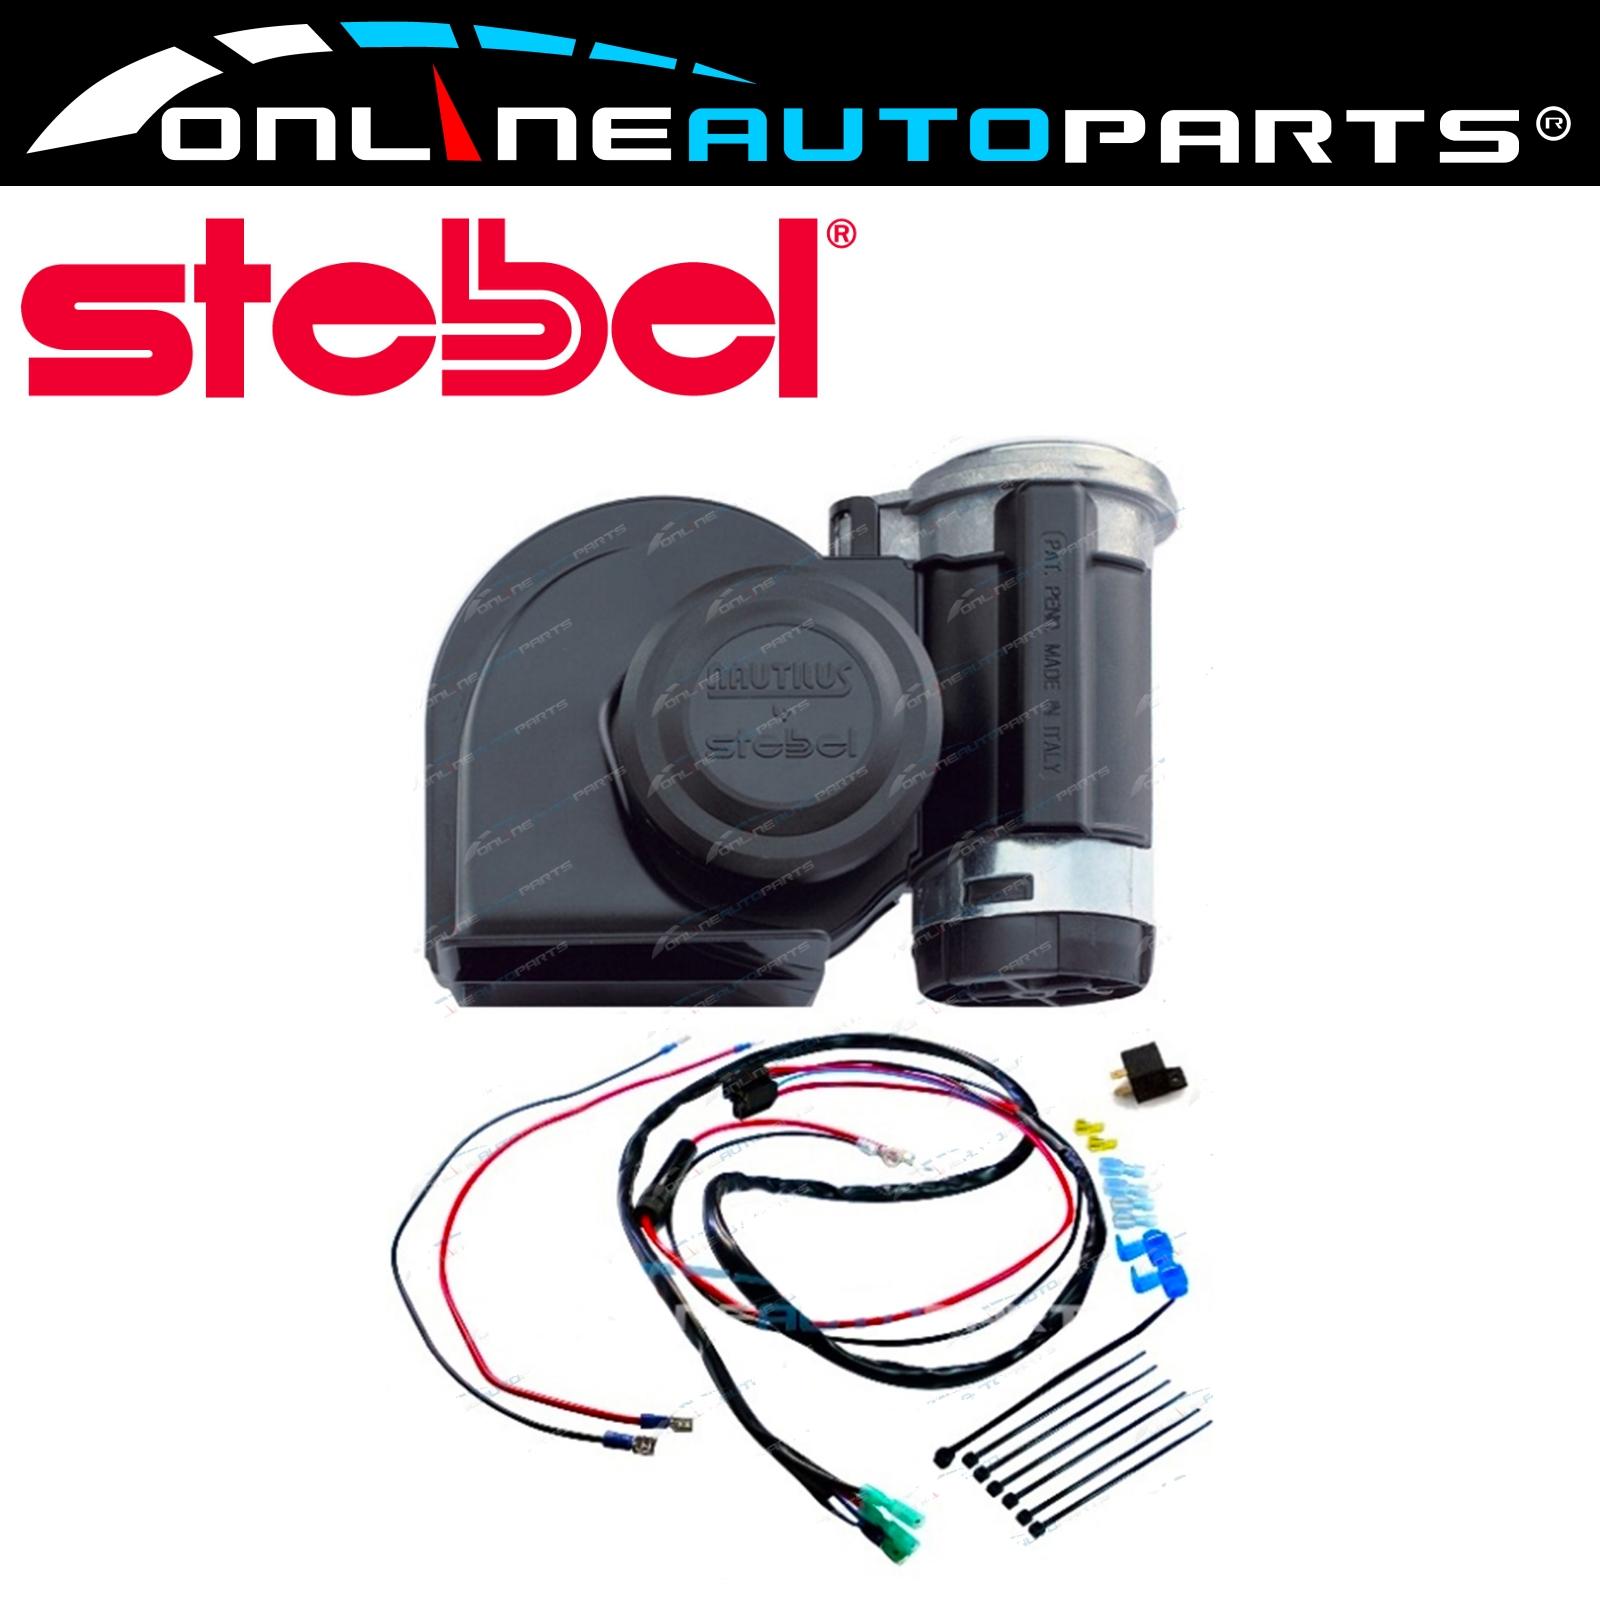 medium resolution of horn relay wiring kit plug n play stebel nautilus air electric car horn relay wiring kit plug n play stebel nautilus air electric car